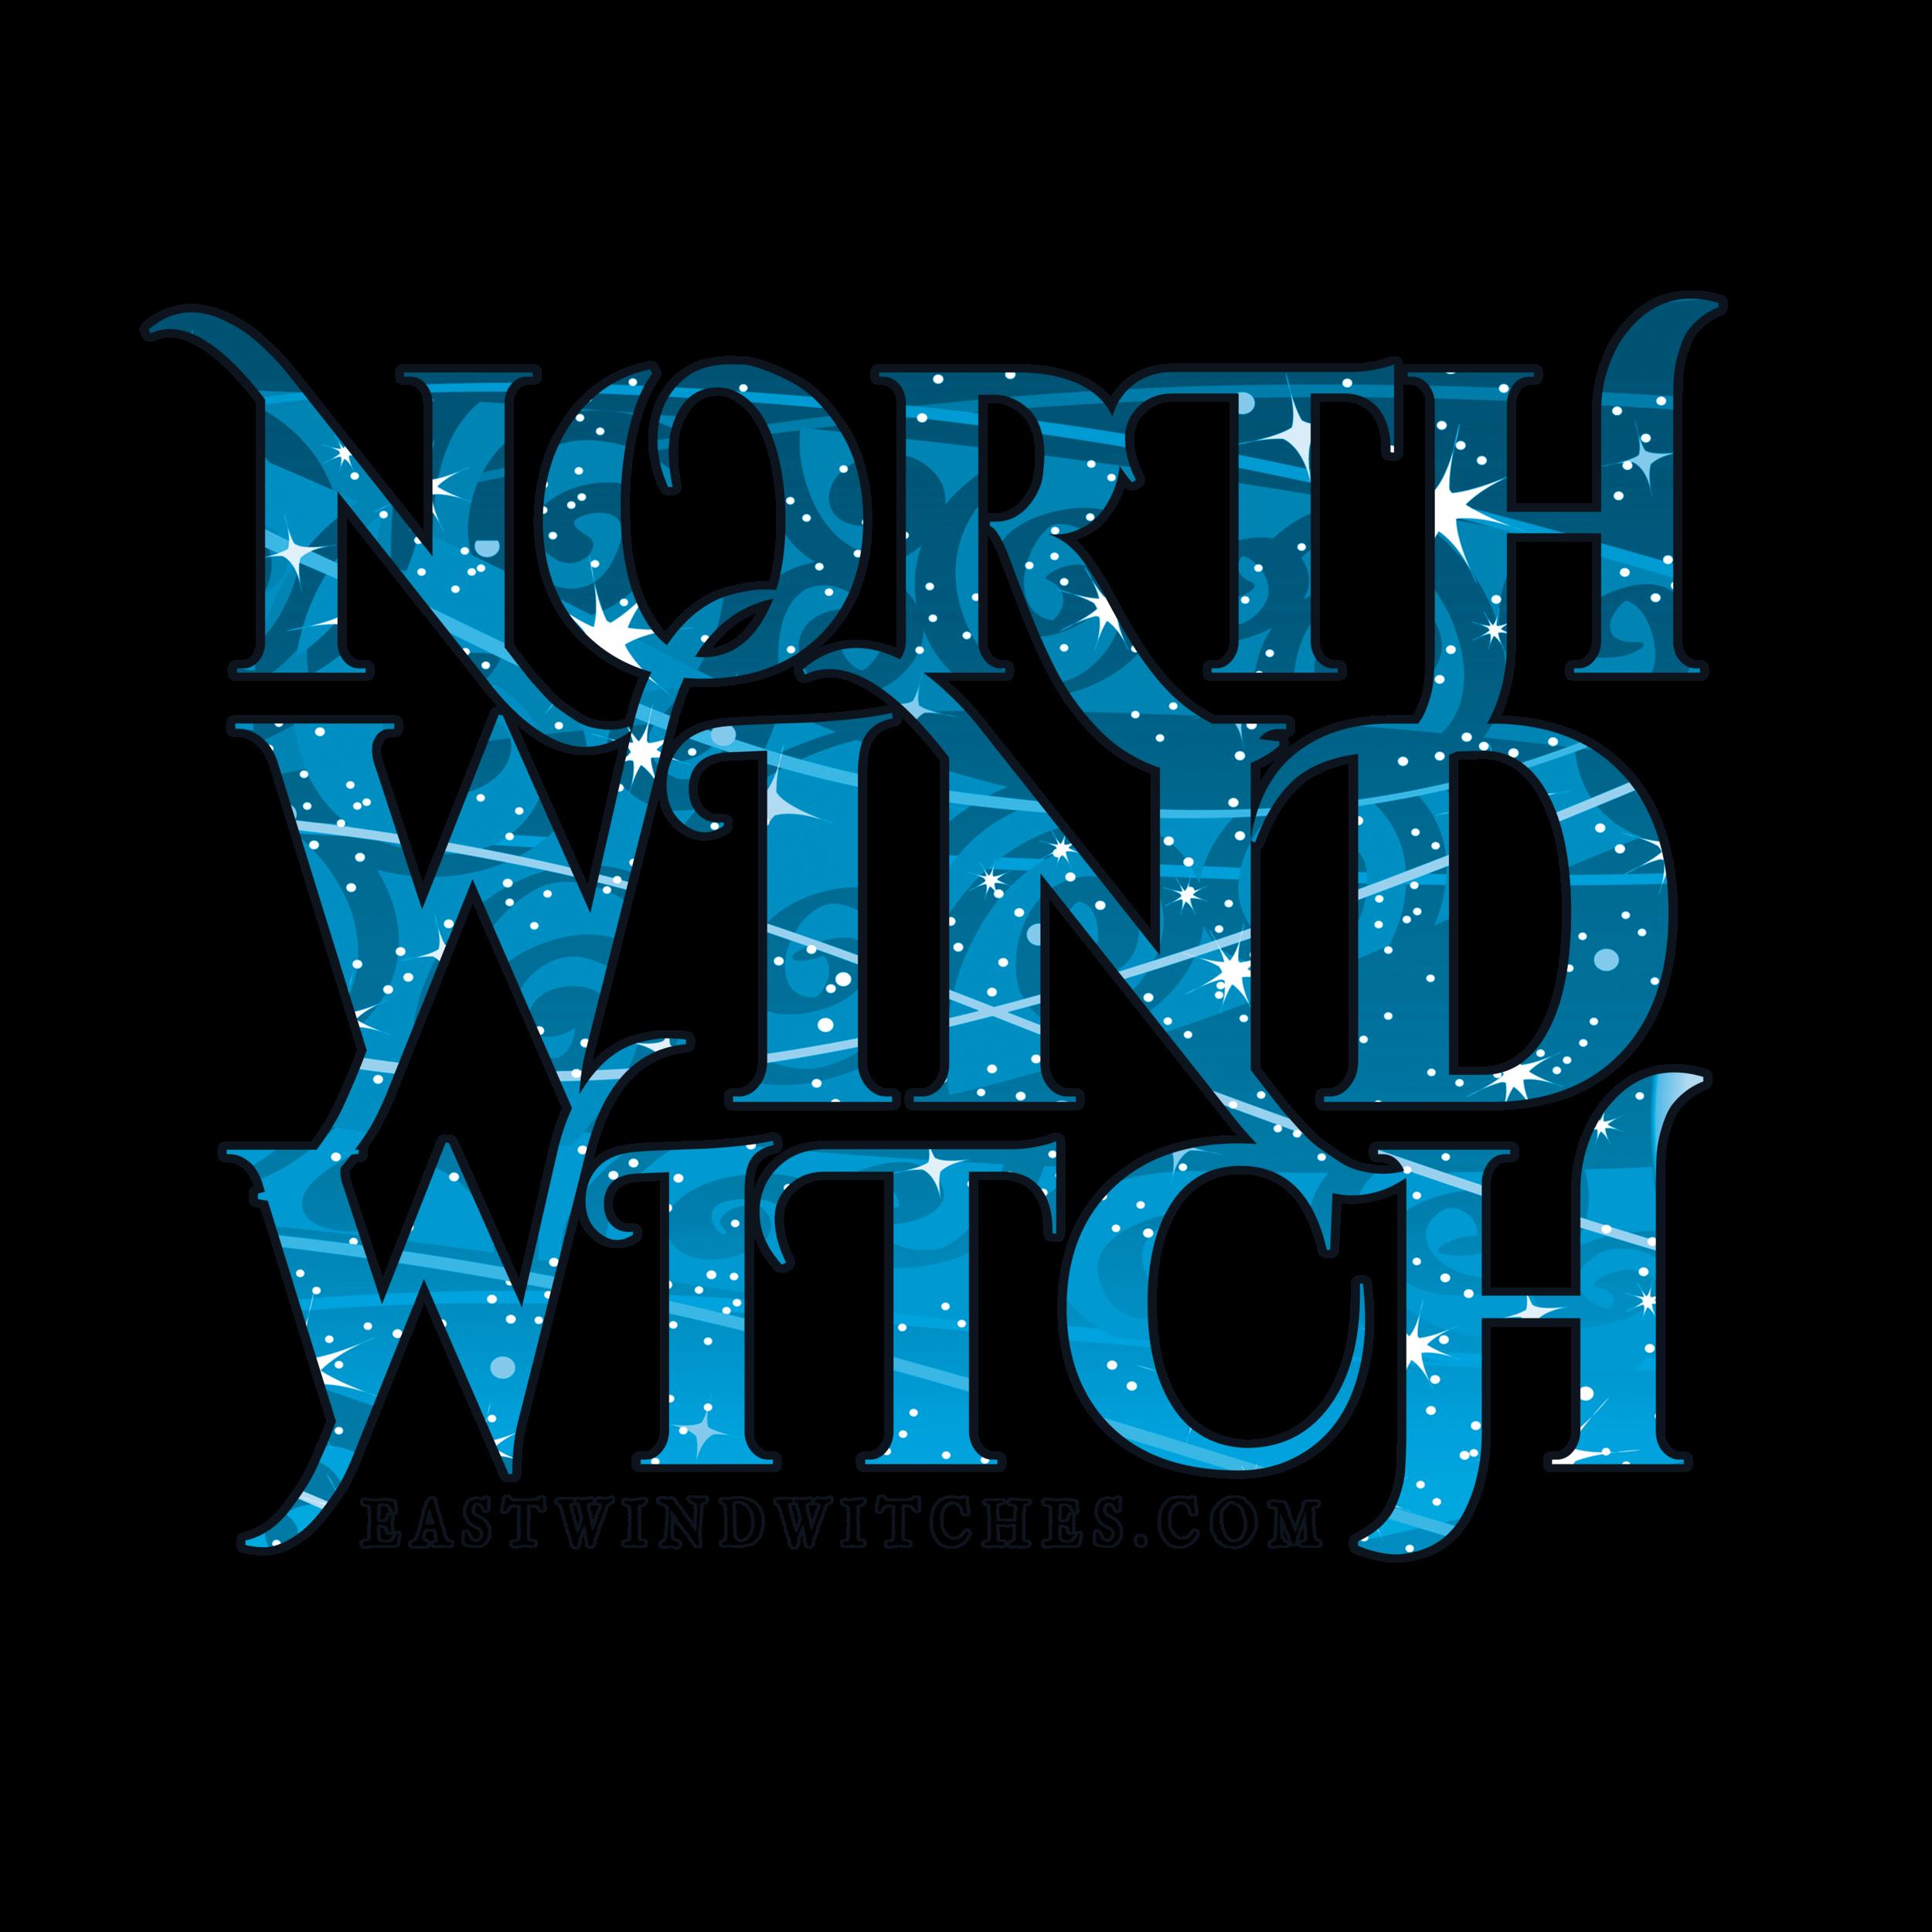 North Wind Witch